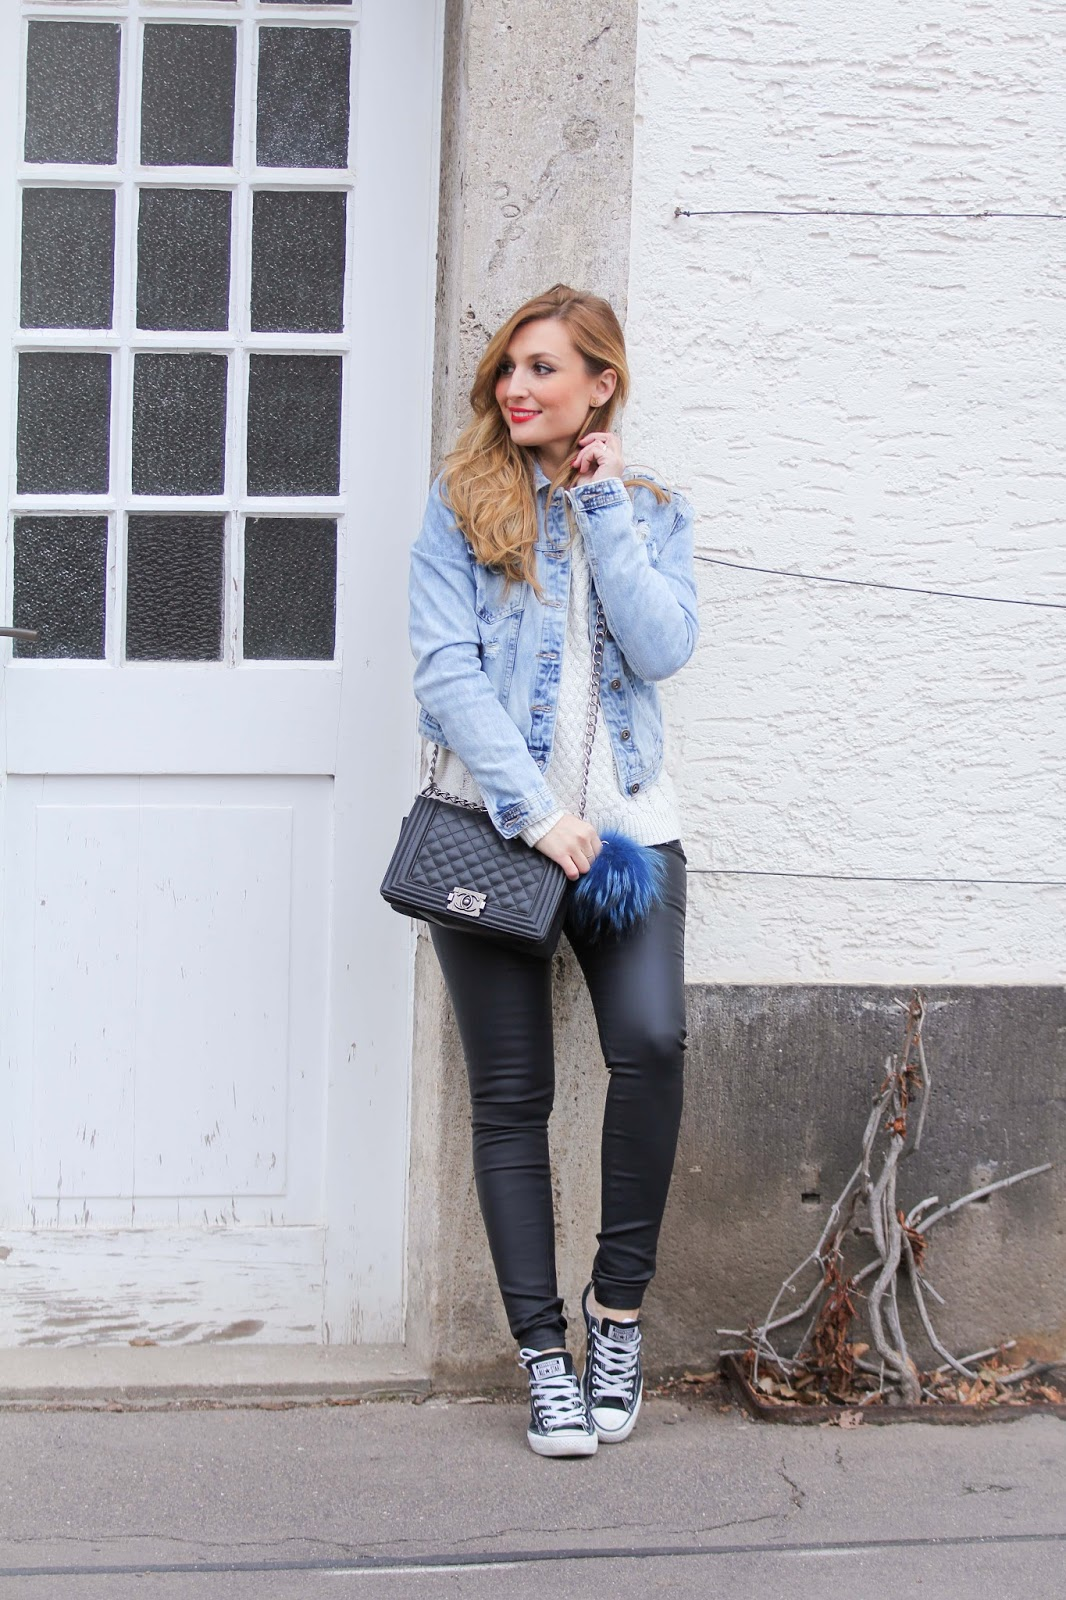 fashionstylebyjohanna-fashionblog-frankfurt-munich-blogger-fashionblogger-bloggerdeutschland-lifestyleblog-modeblog-germanblogger-styleblog-Wollpullover-a-la-streetwear-chic